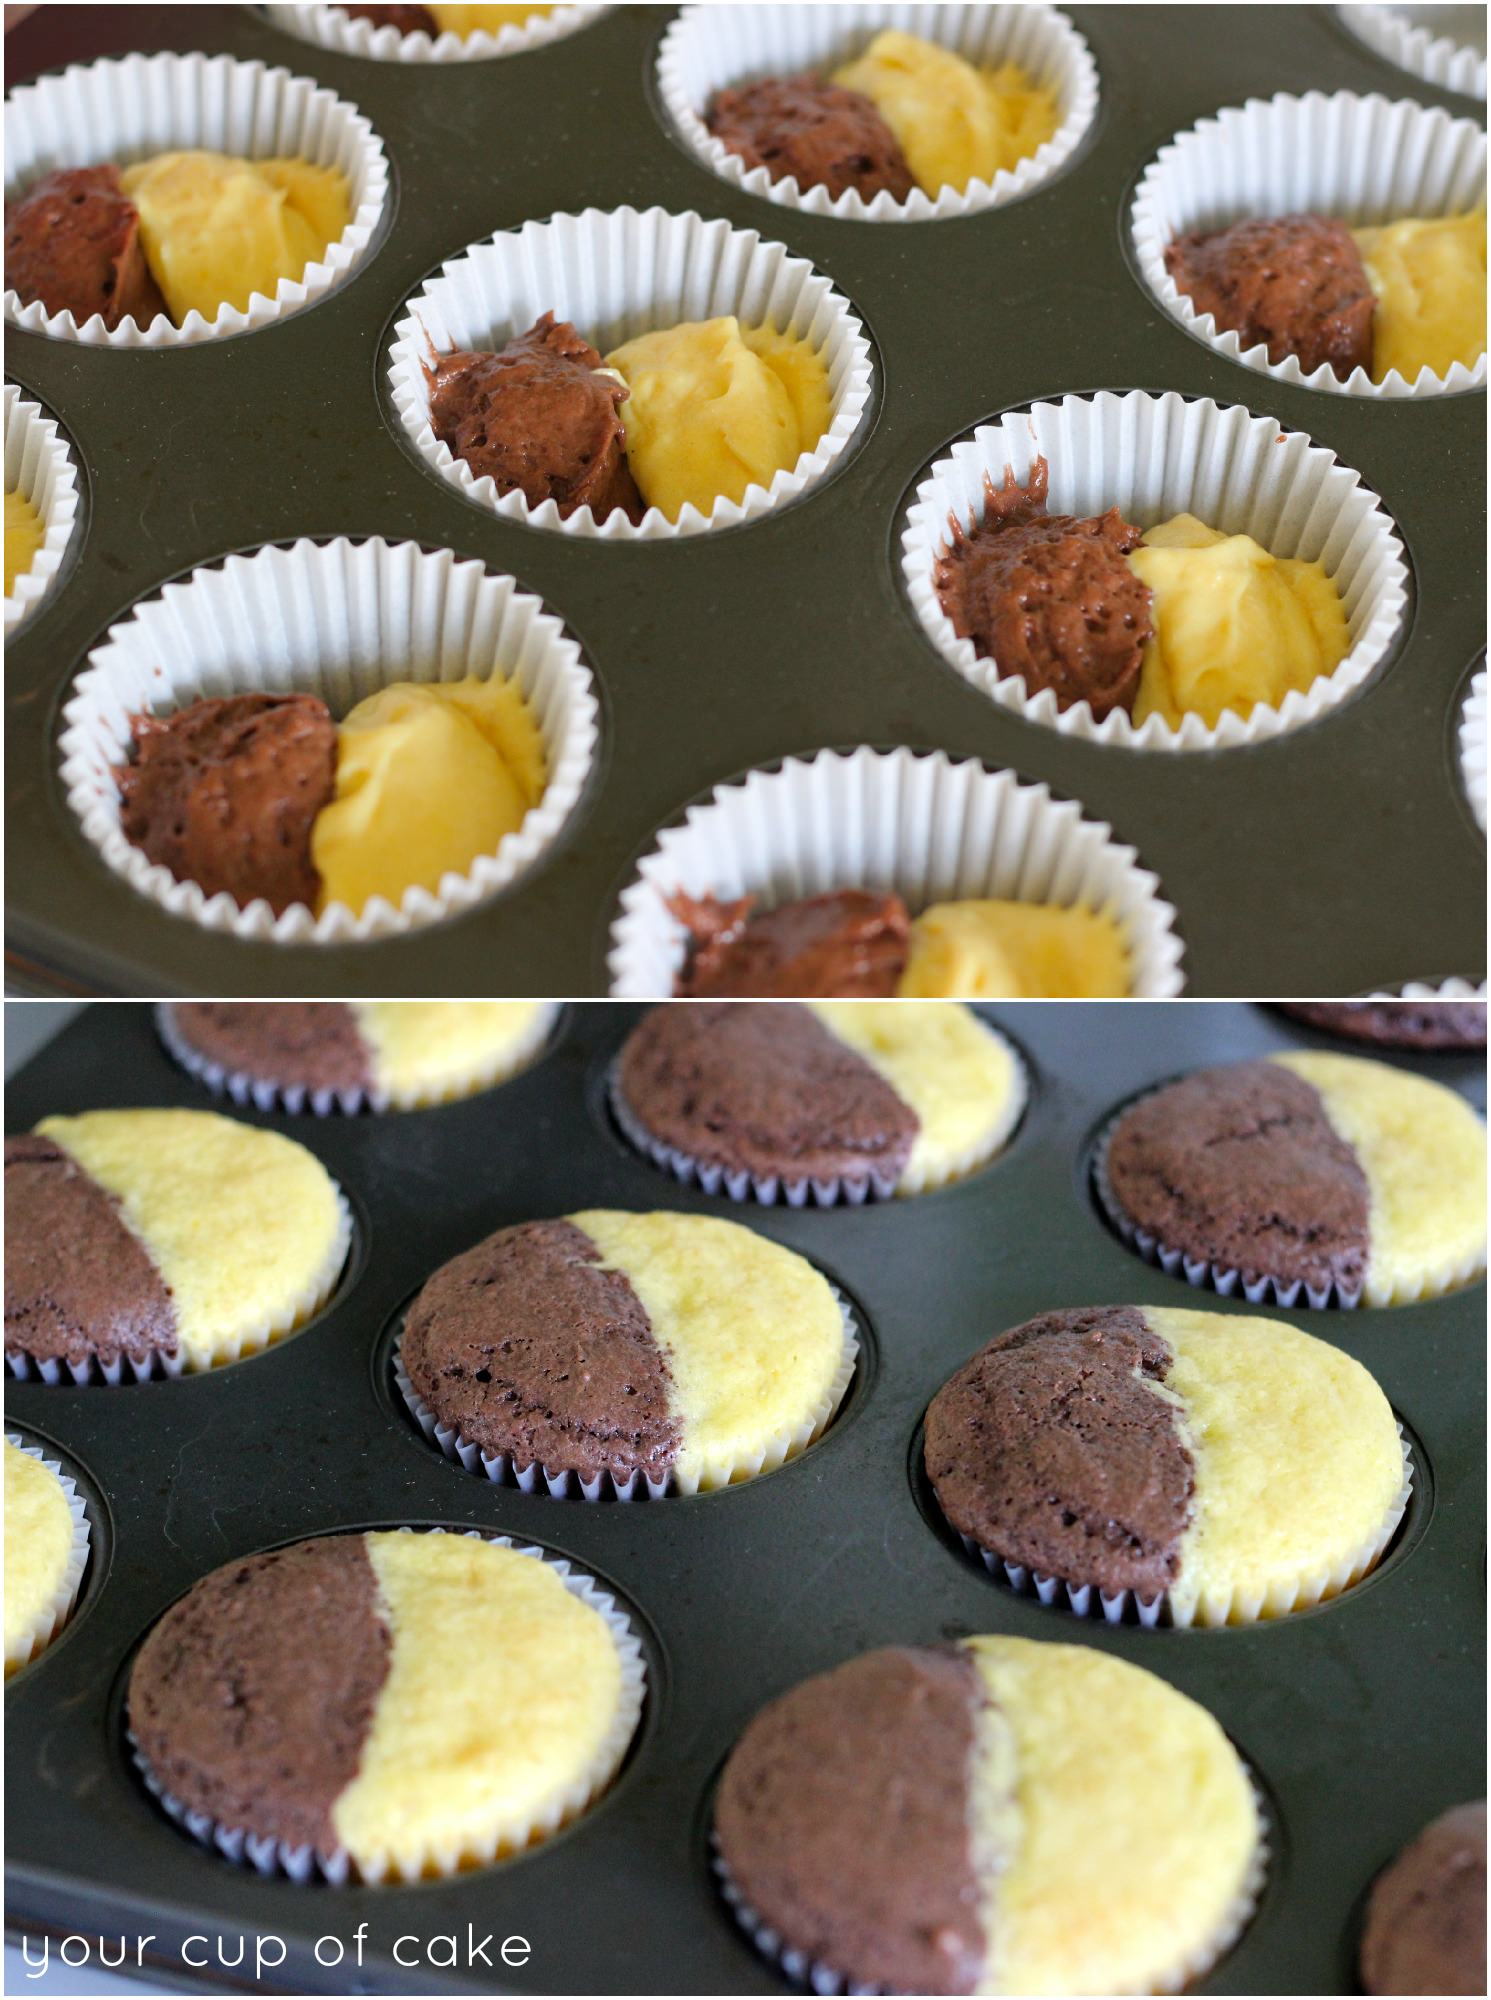 How to make split cupcakes